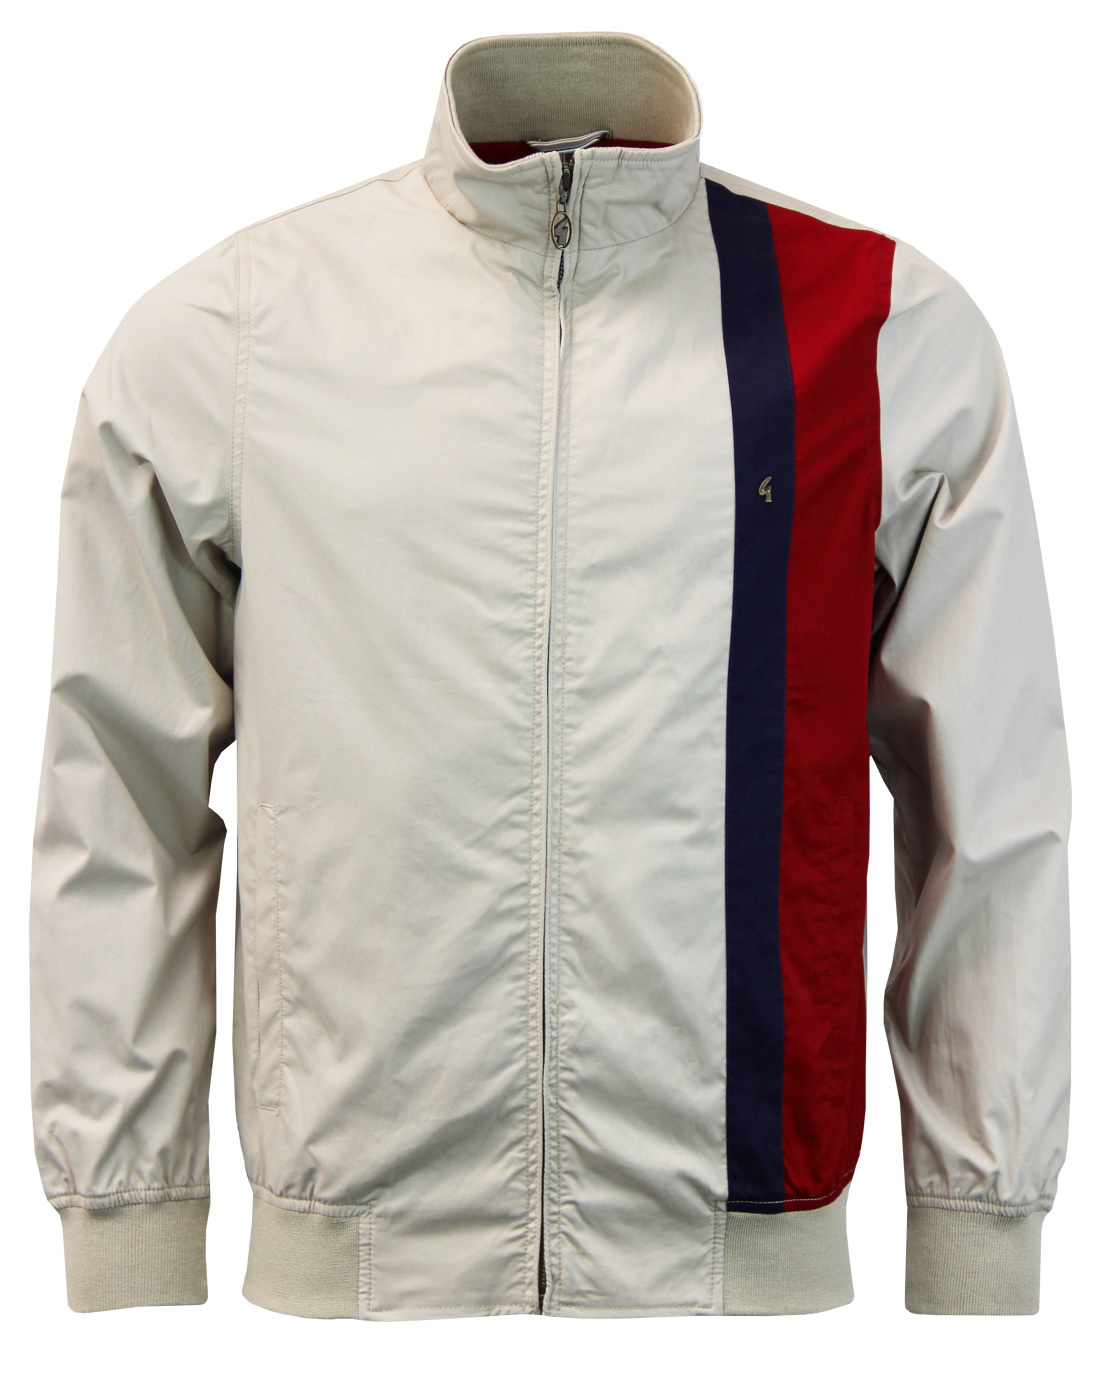 gabicci vintage samson retro mod racing stripe harrington